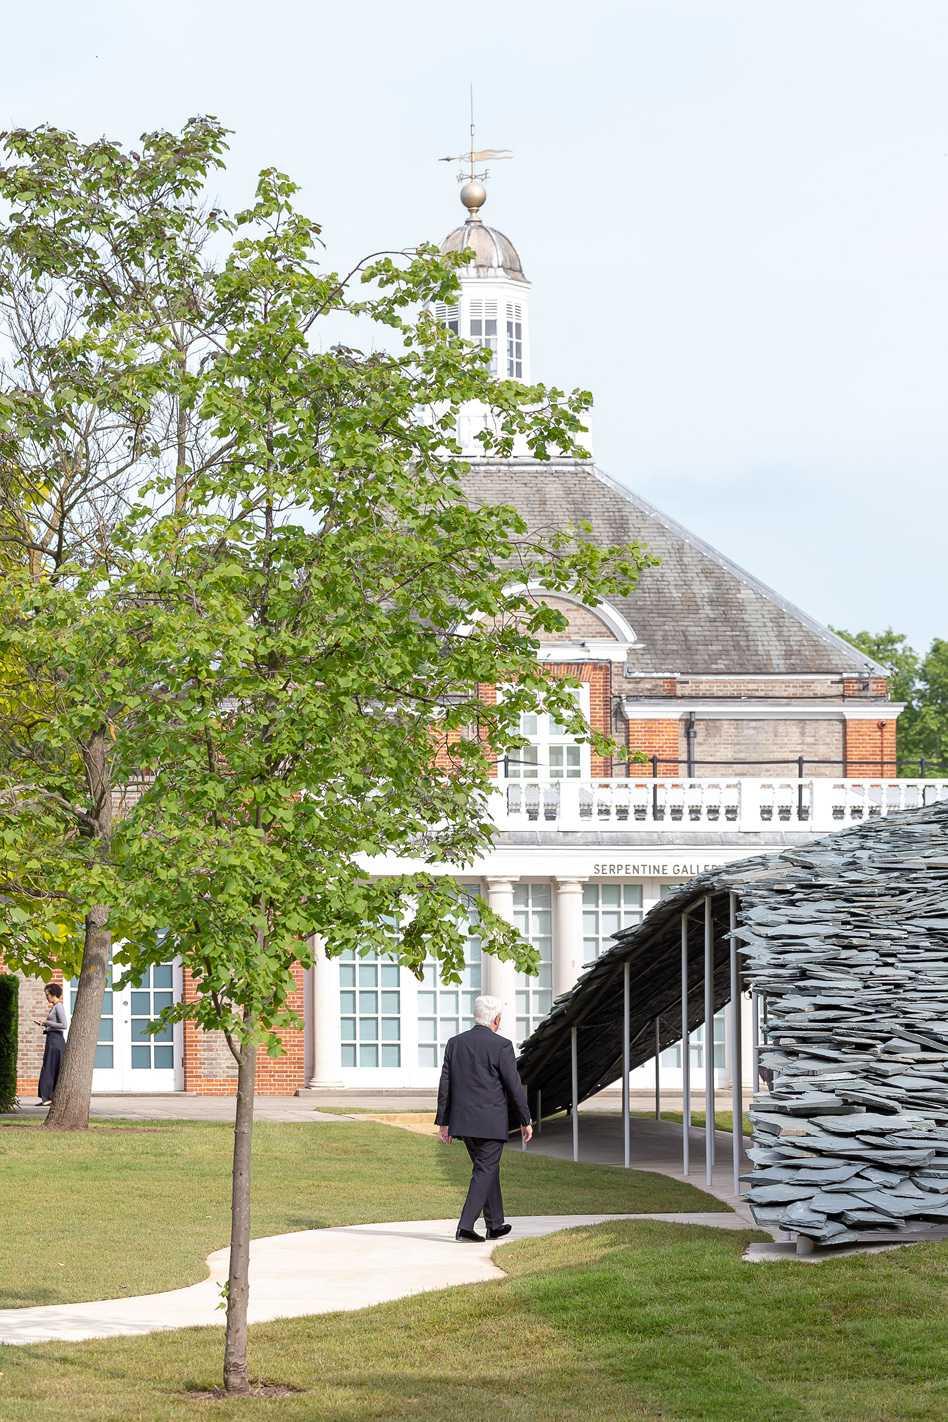 Serpentine Pavilion 2019  - 3.1 Norbert Tukaj 34